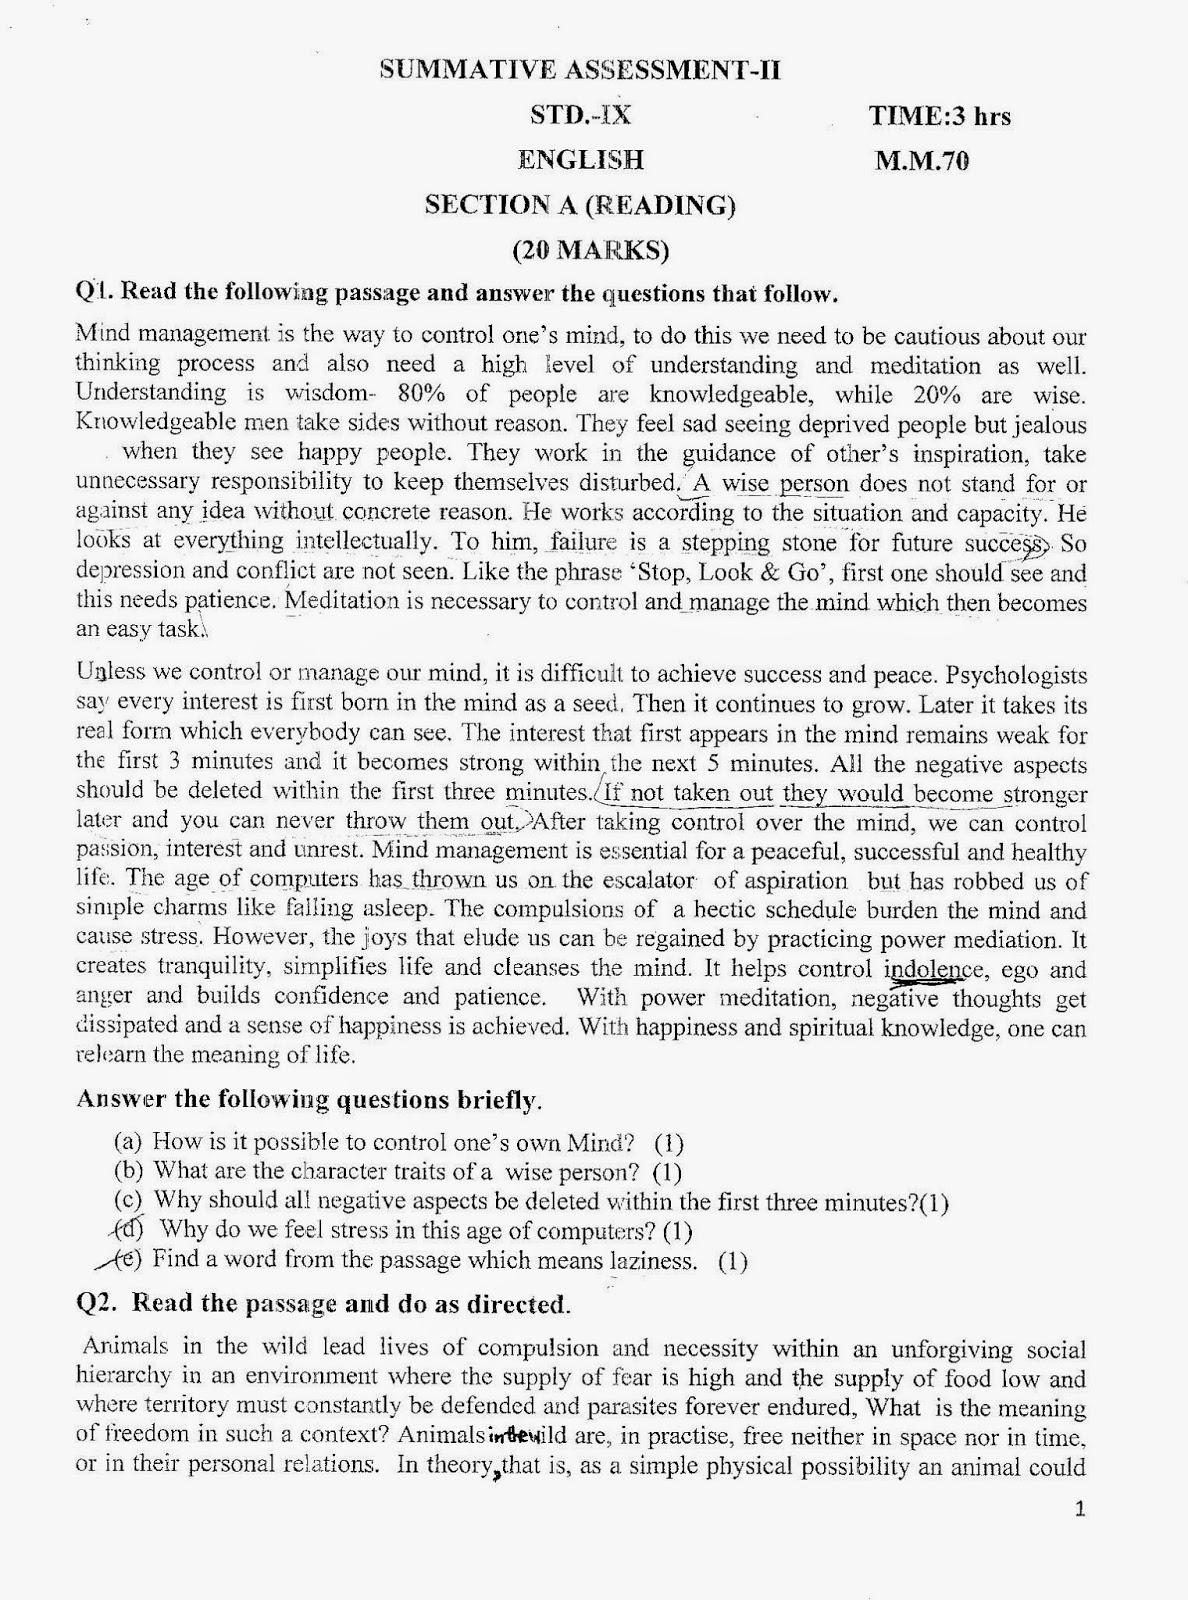 social categorization essay Free essay: consequences of social categorization and social identity theories  vernon smith ba426 managing cultural diversity.